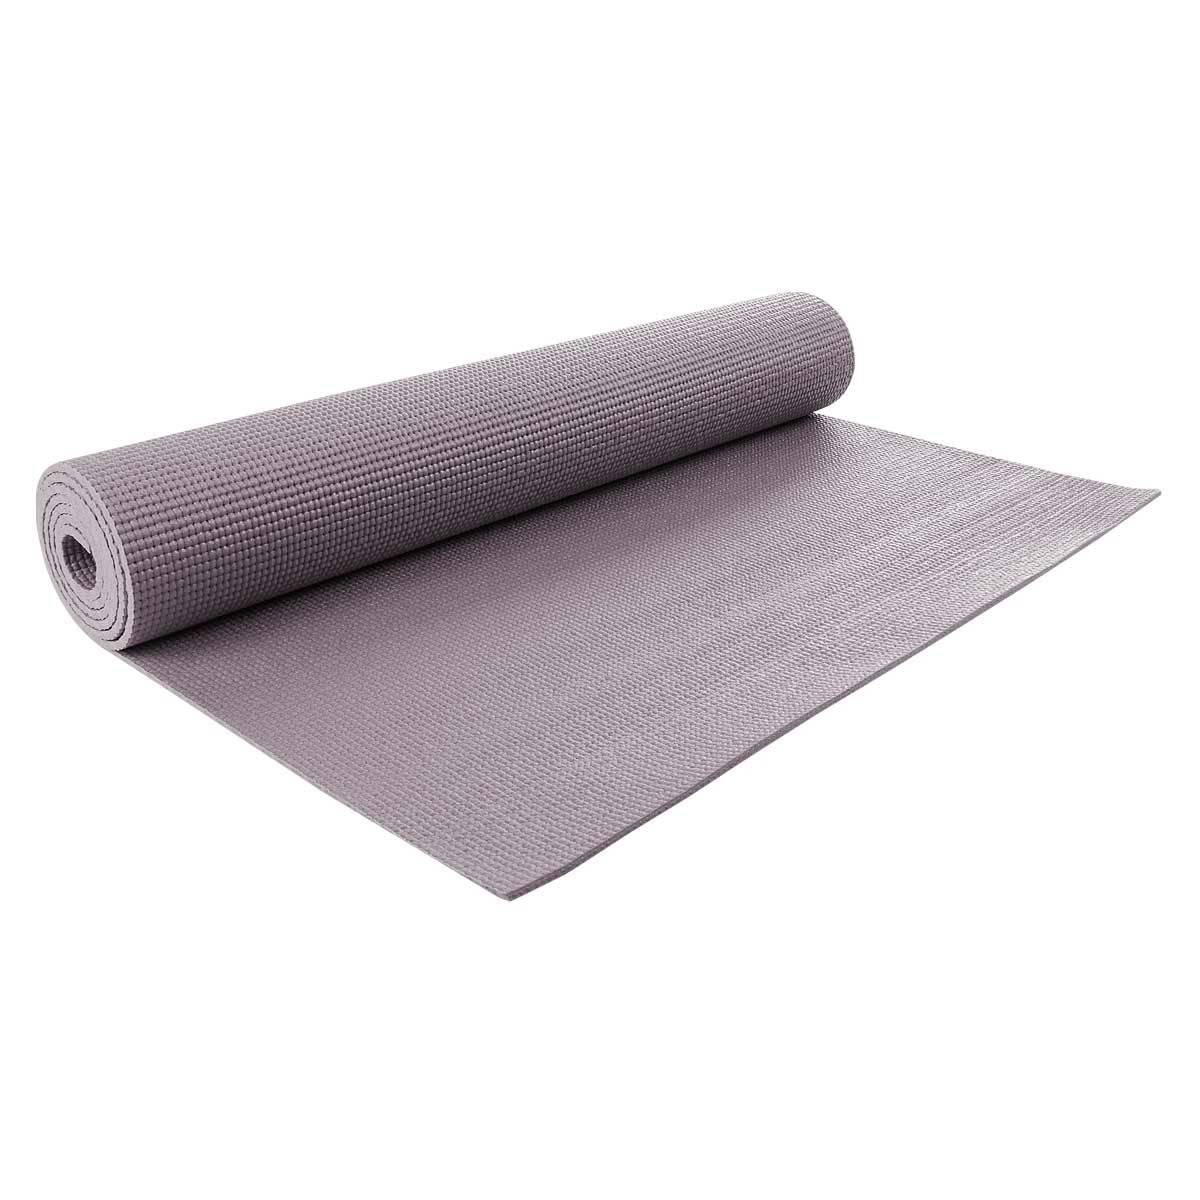 Tapete de yoga AP-009